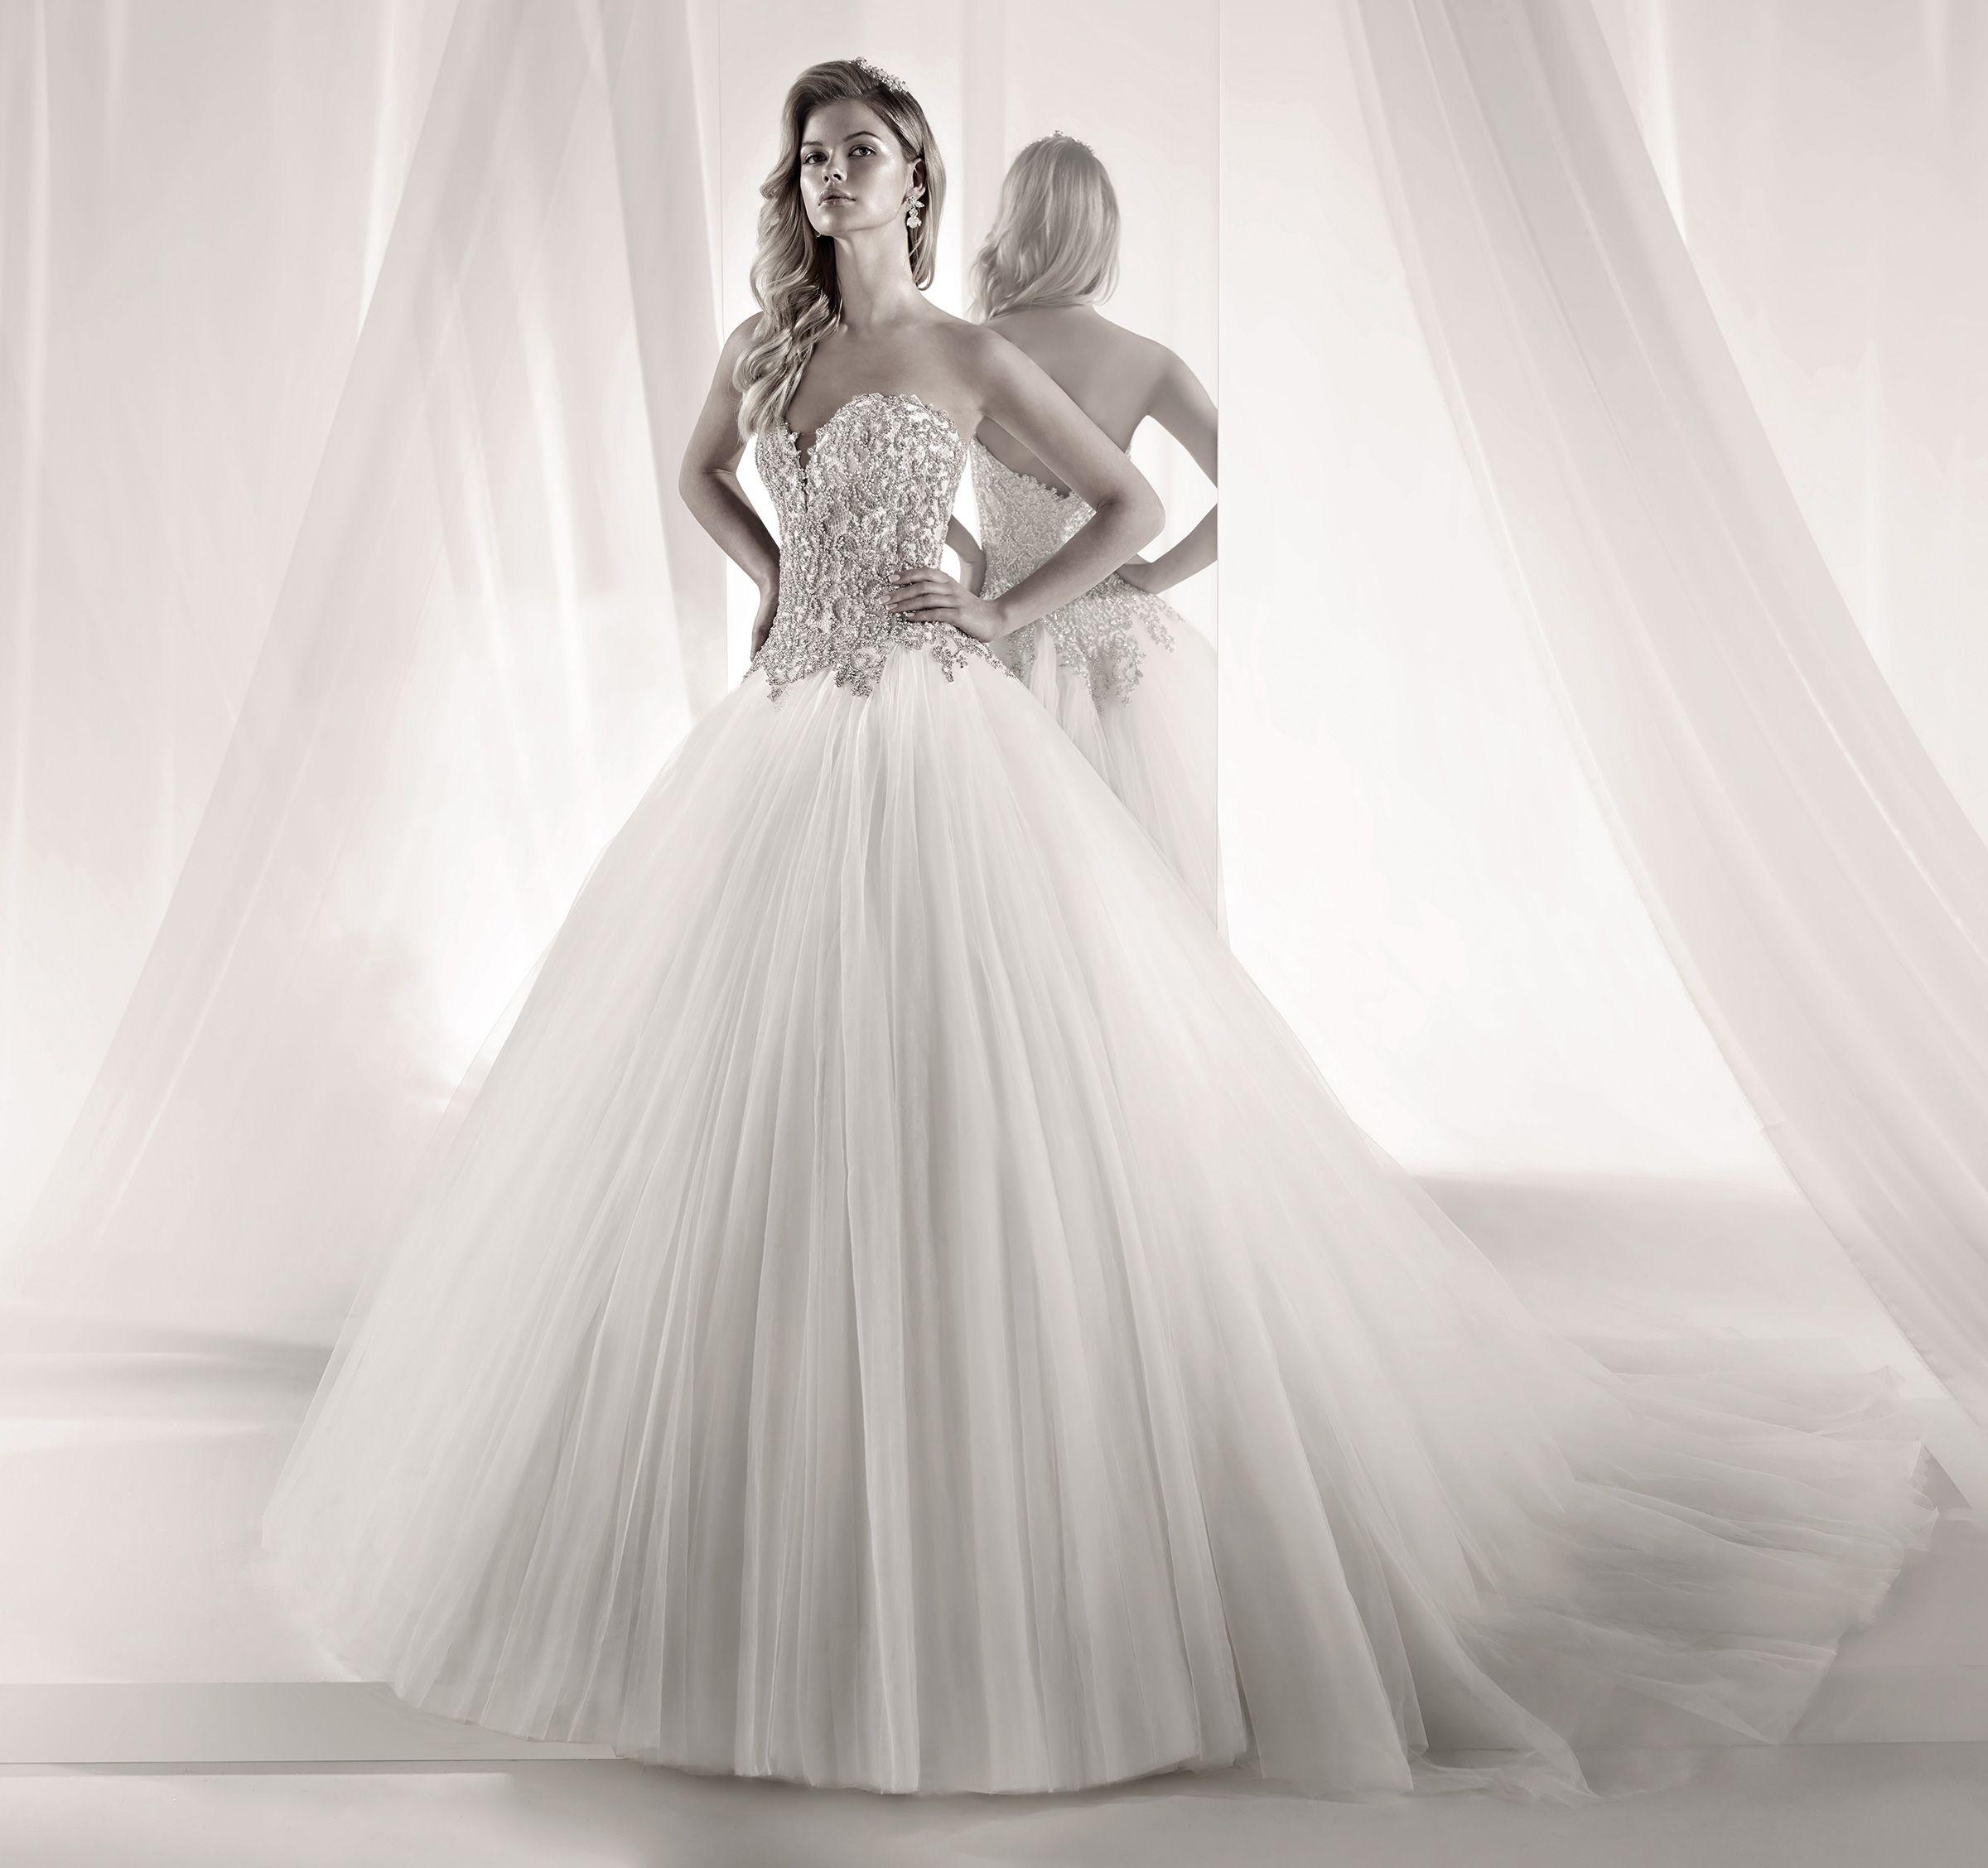 Nicole Luxury 2019 Collection Elegant And